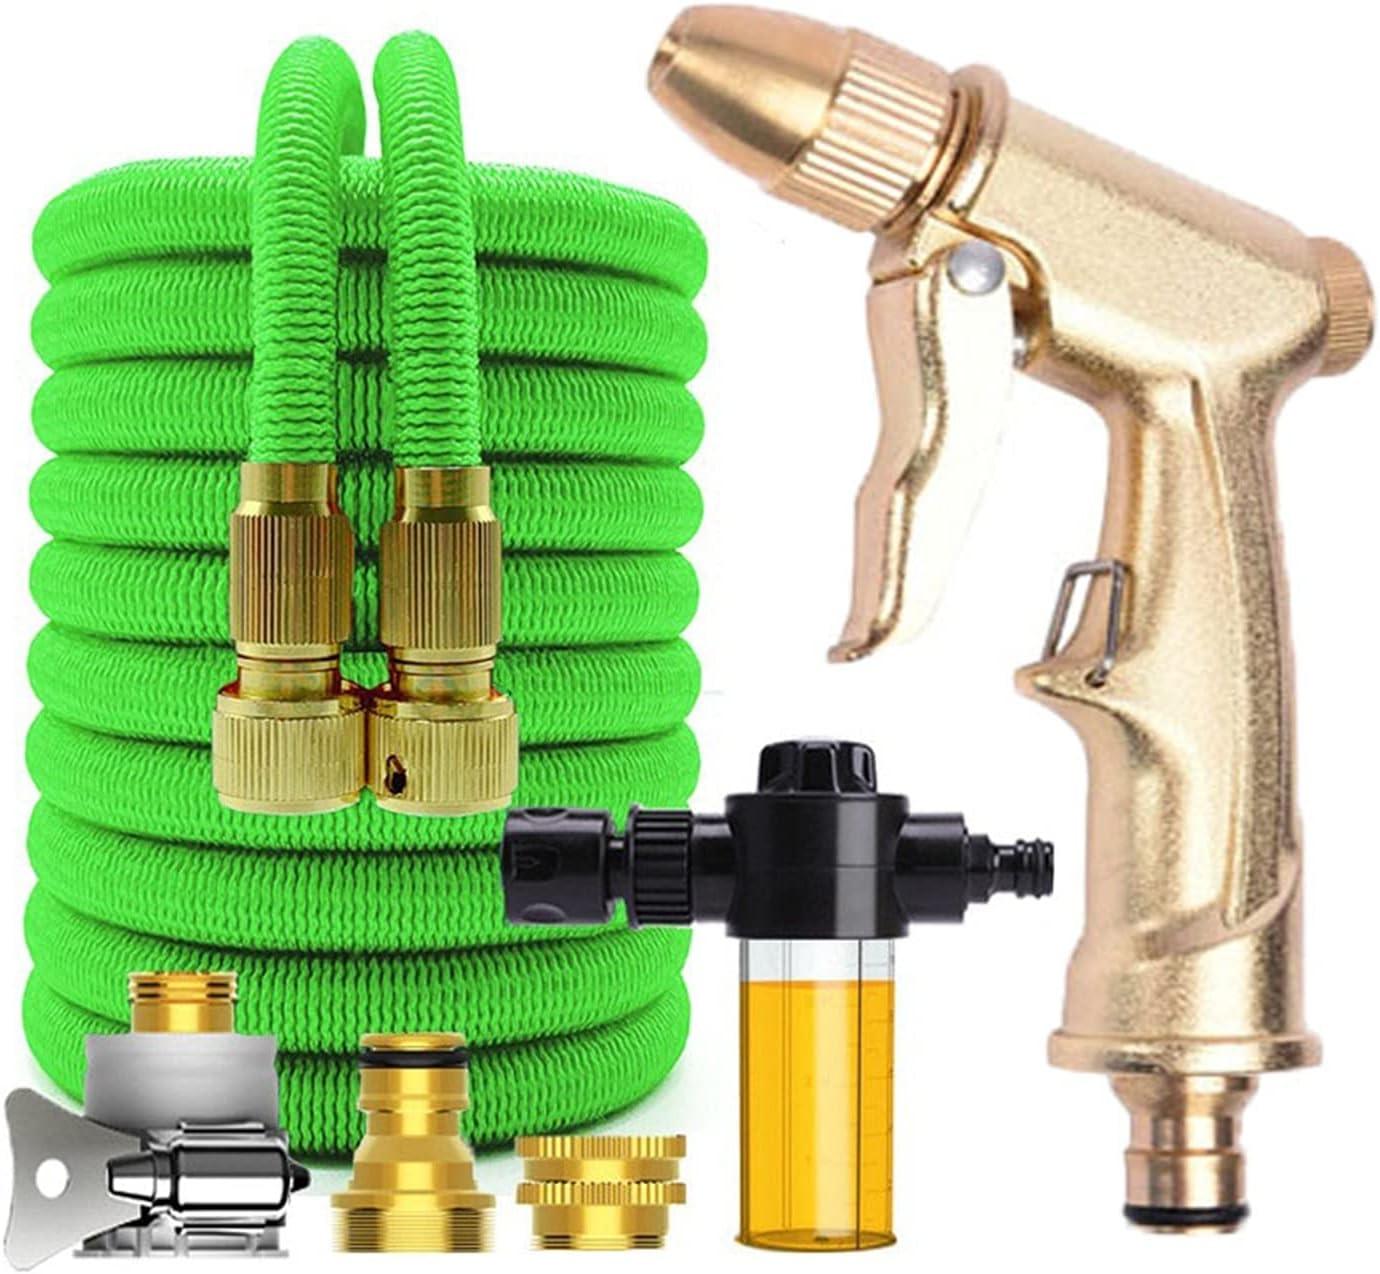 SHUANGXI benliestore Magic Flexible high-Pressure Sales Sprinkler Foam Be super welcome